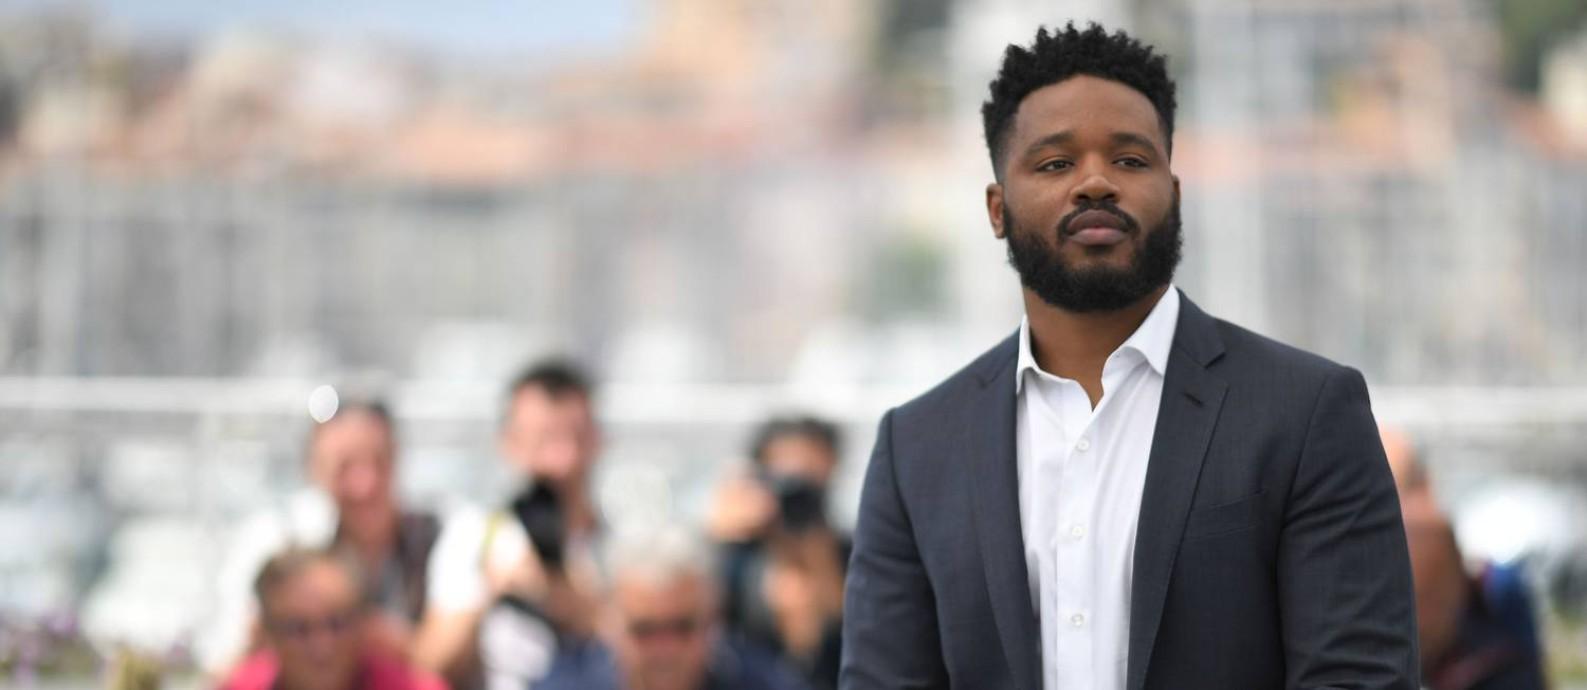 O cineasta americano Ryan Coogler, de 'Pantera Negra', em Cannes Foto: LOIC VENANCE / AFP